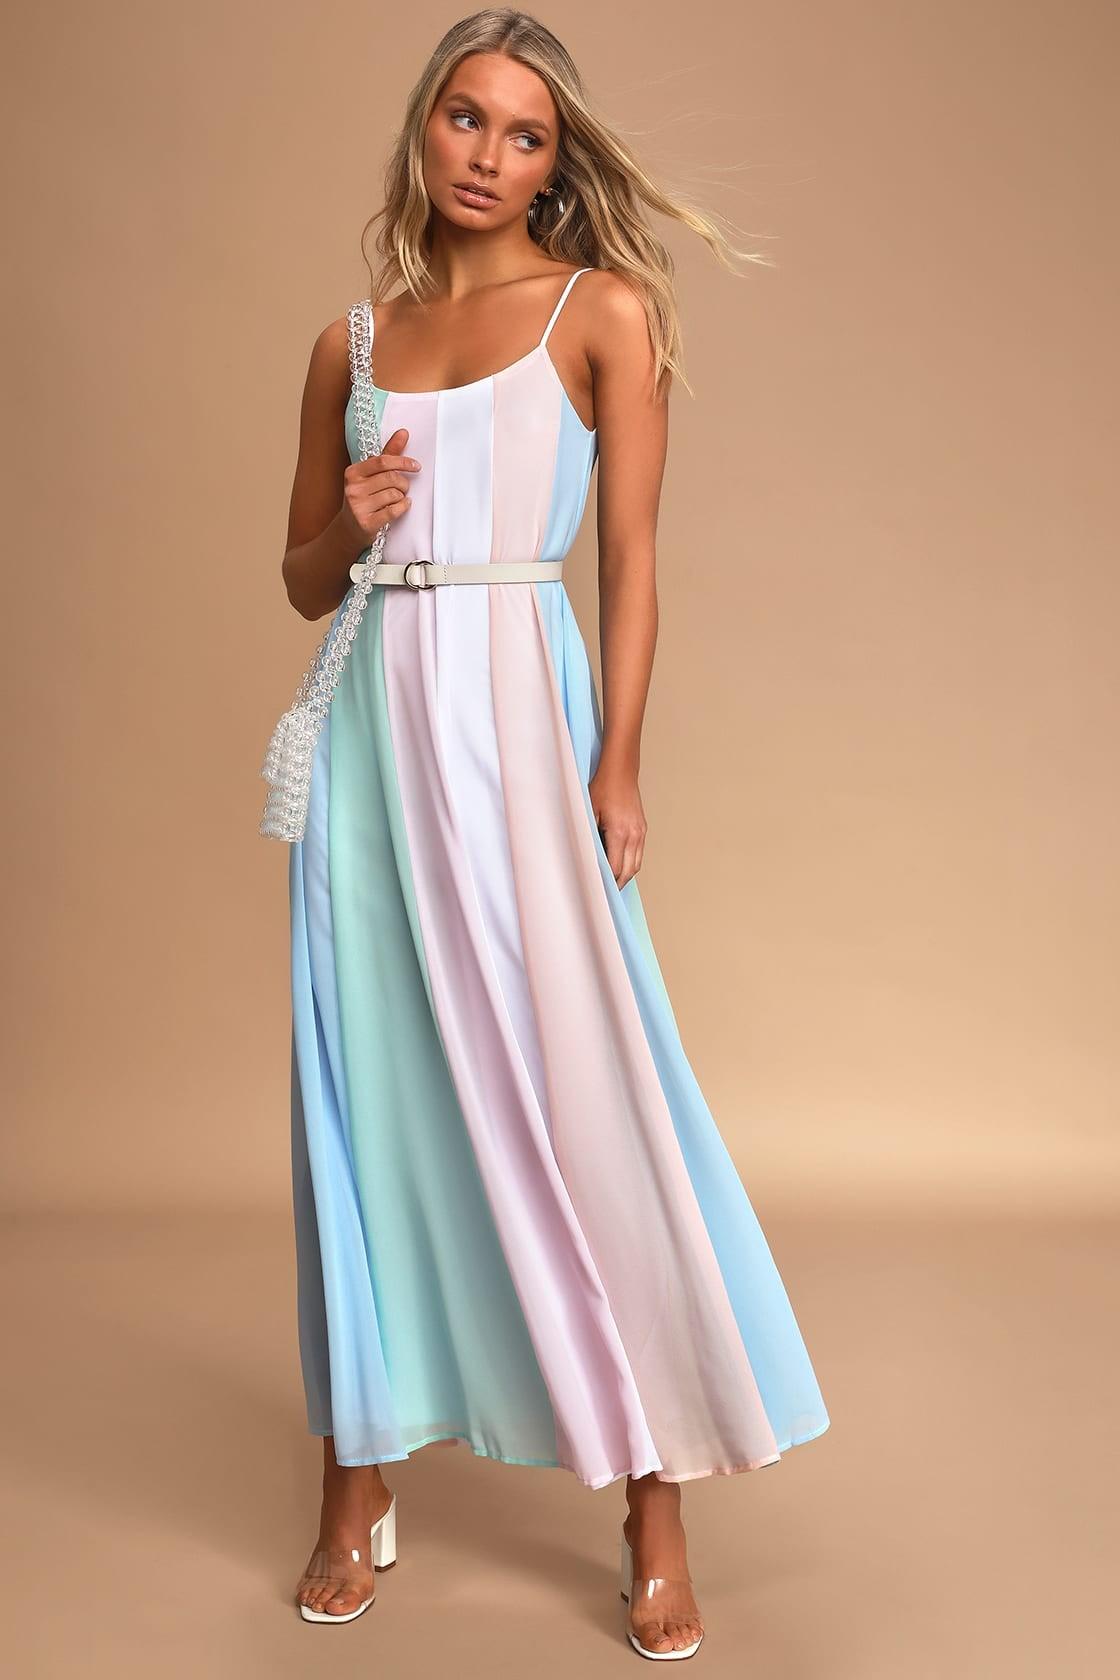 sundress for wedding guest